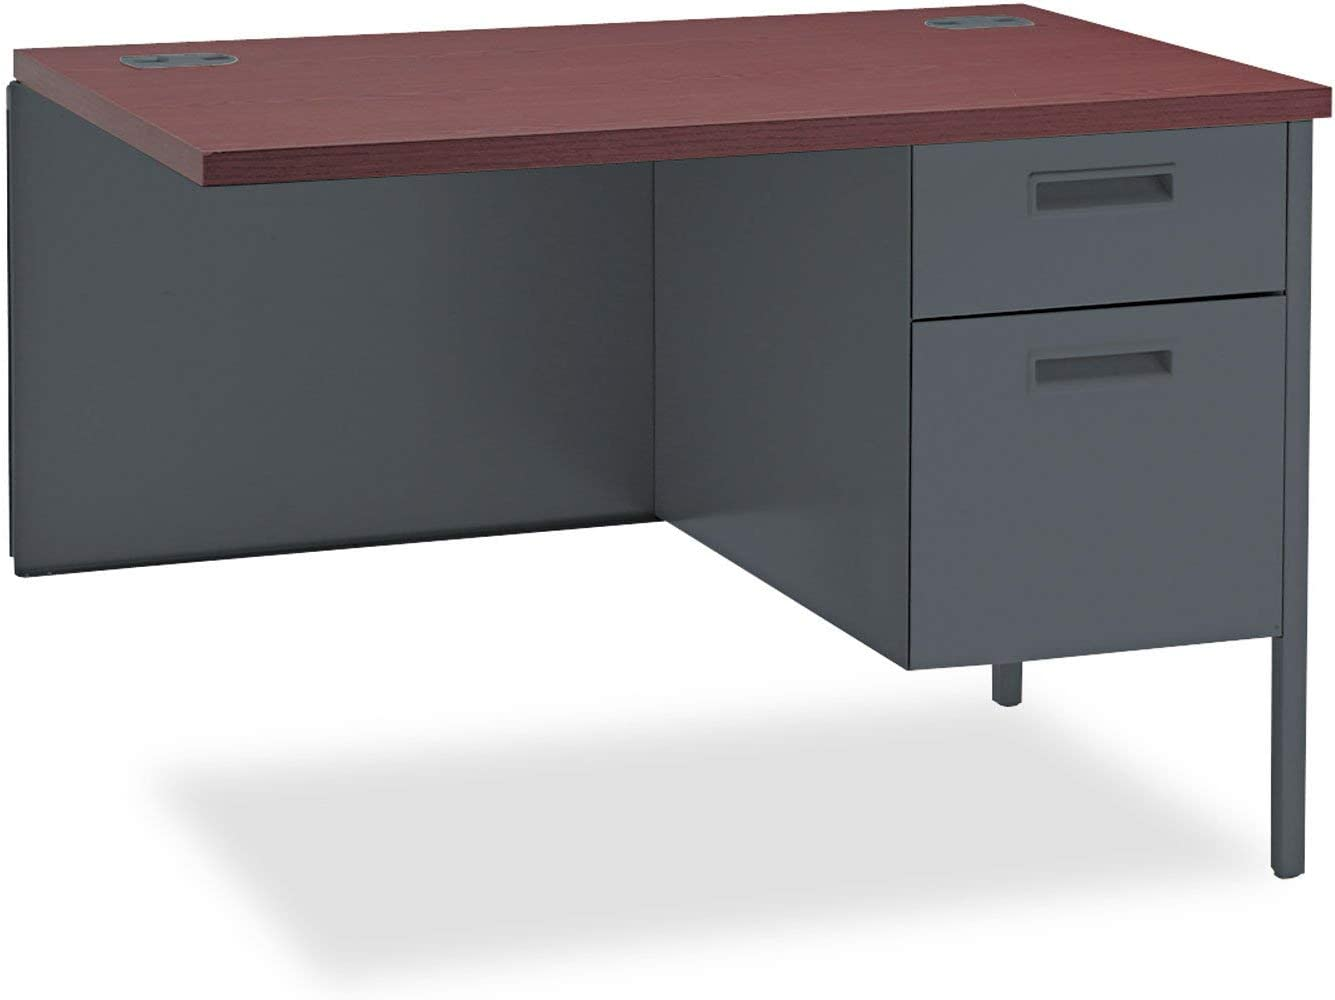 Mahogany//Charcoal 10500 Series Single Pedestal Desk Return Finish